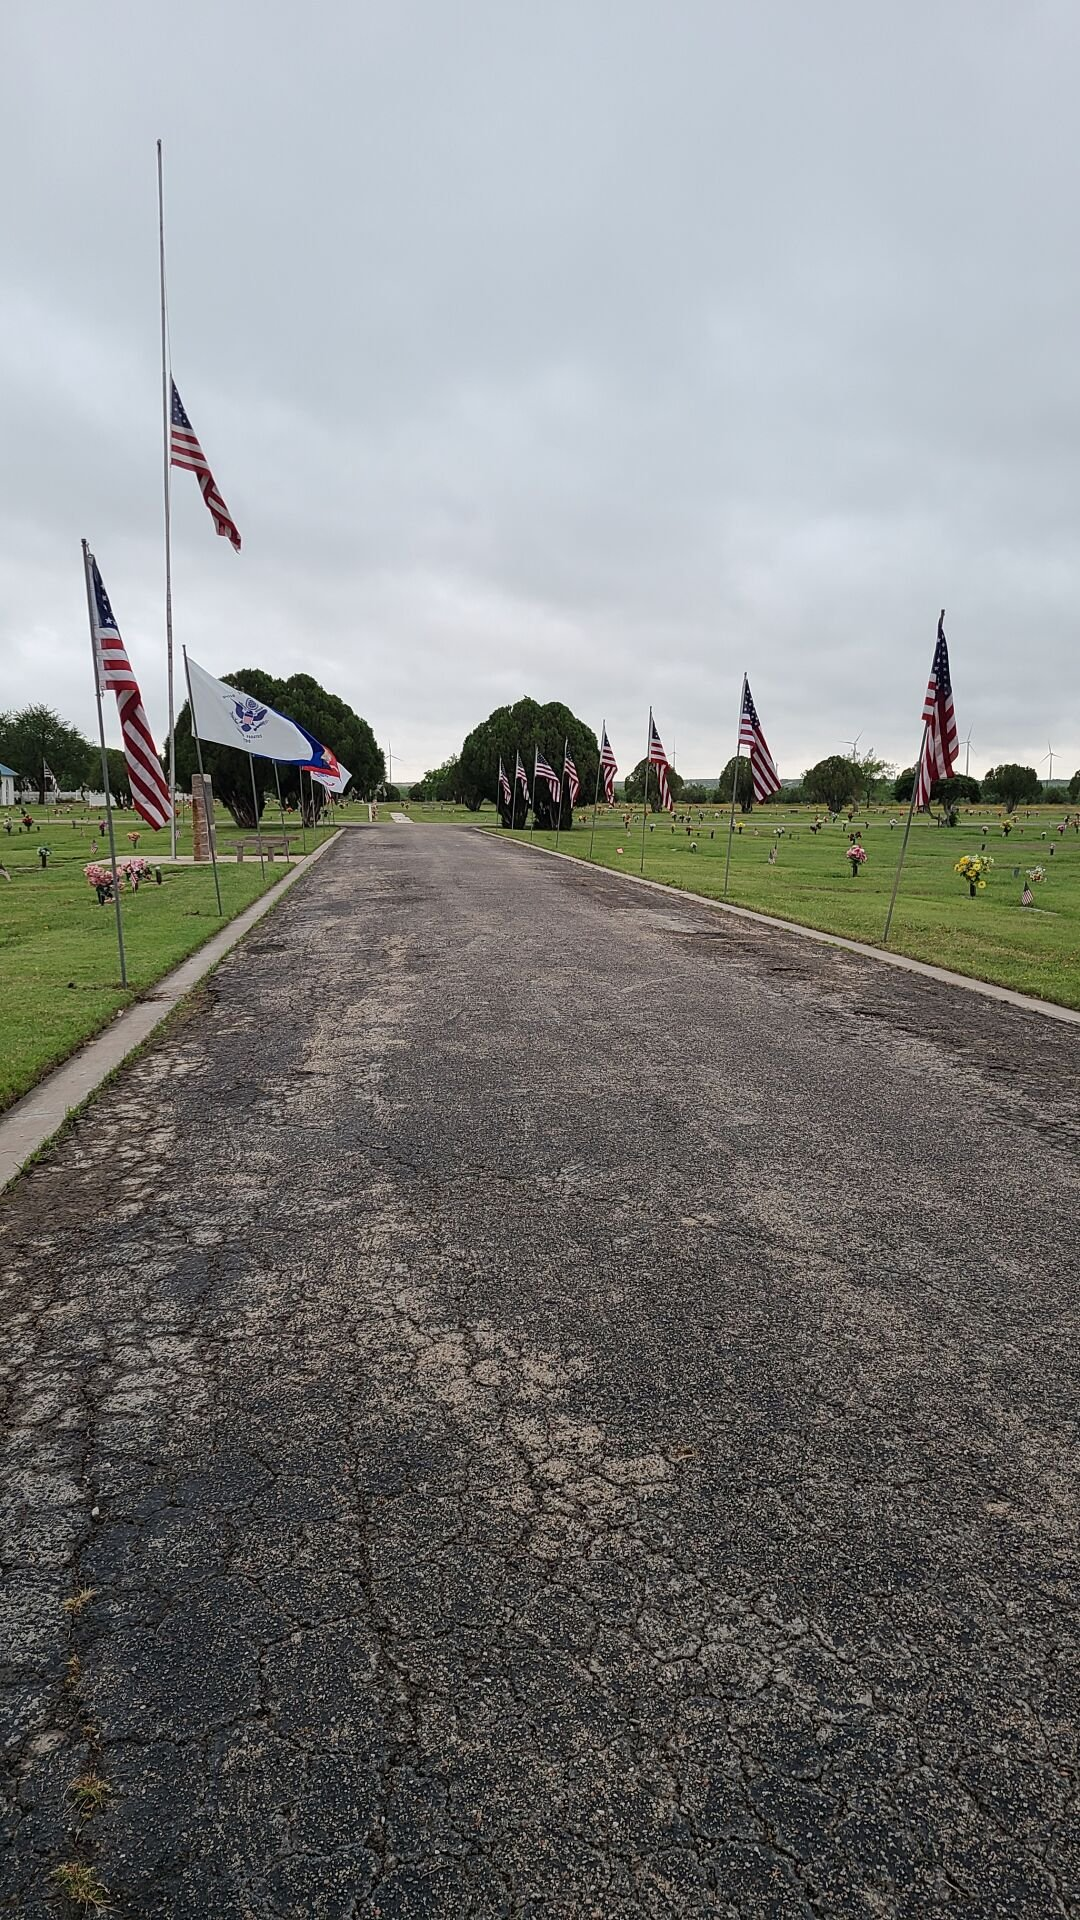 Flags at Trinity Memorial